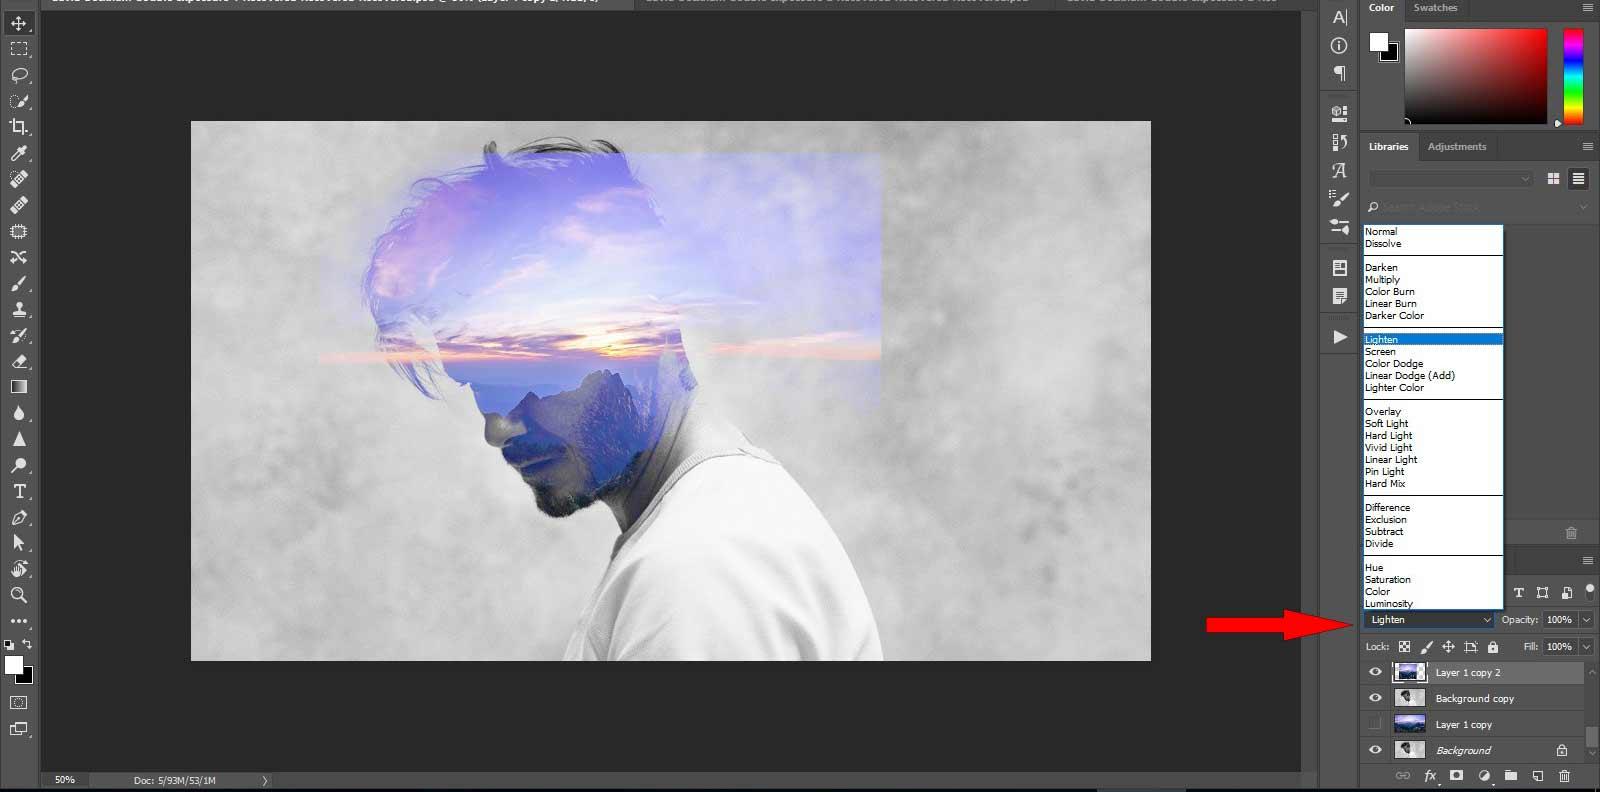 ویژگیBlending Mode در فتوشاپ جهت ساخت double exposure